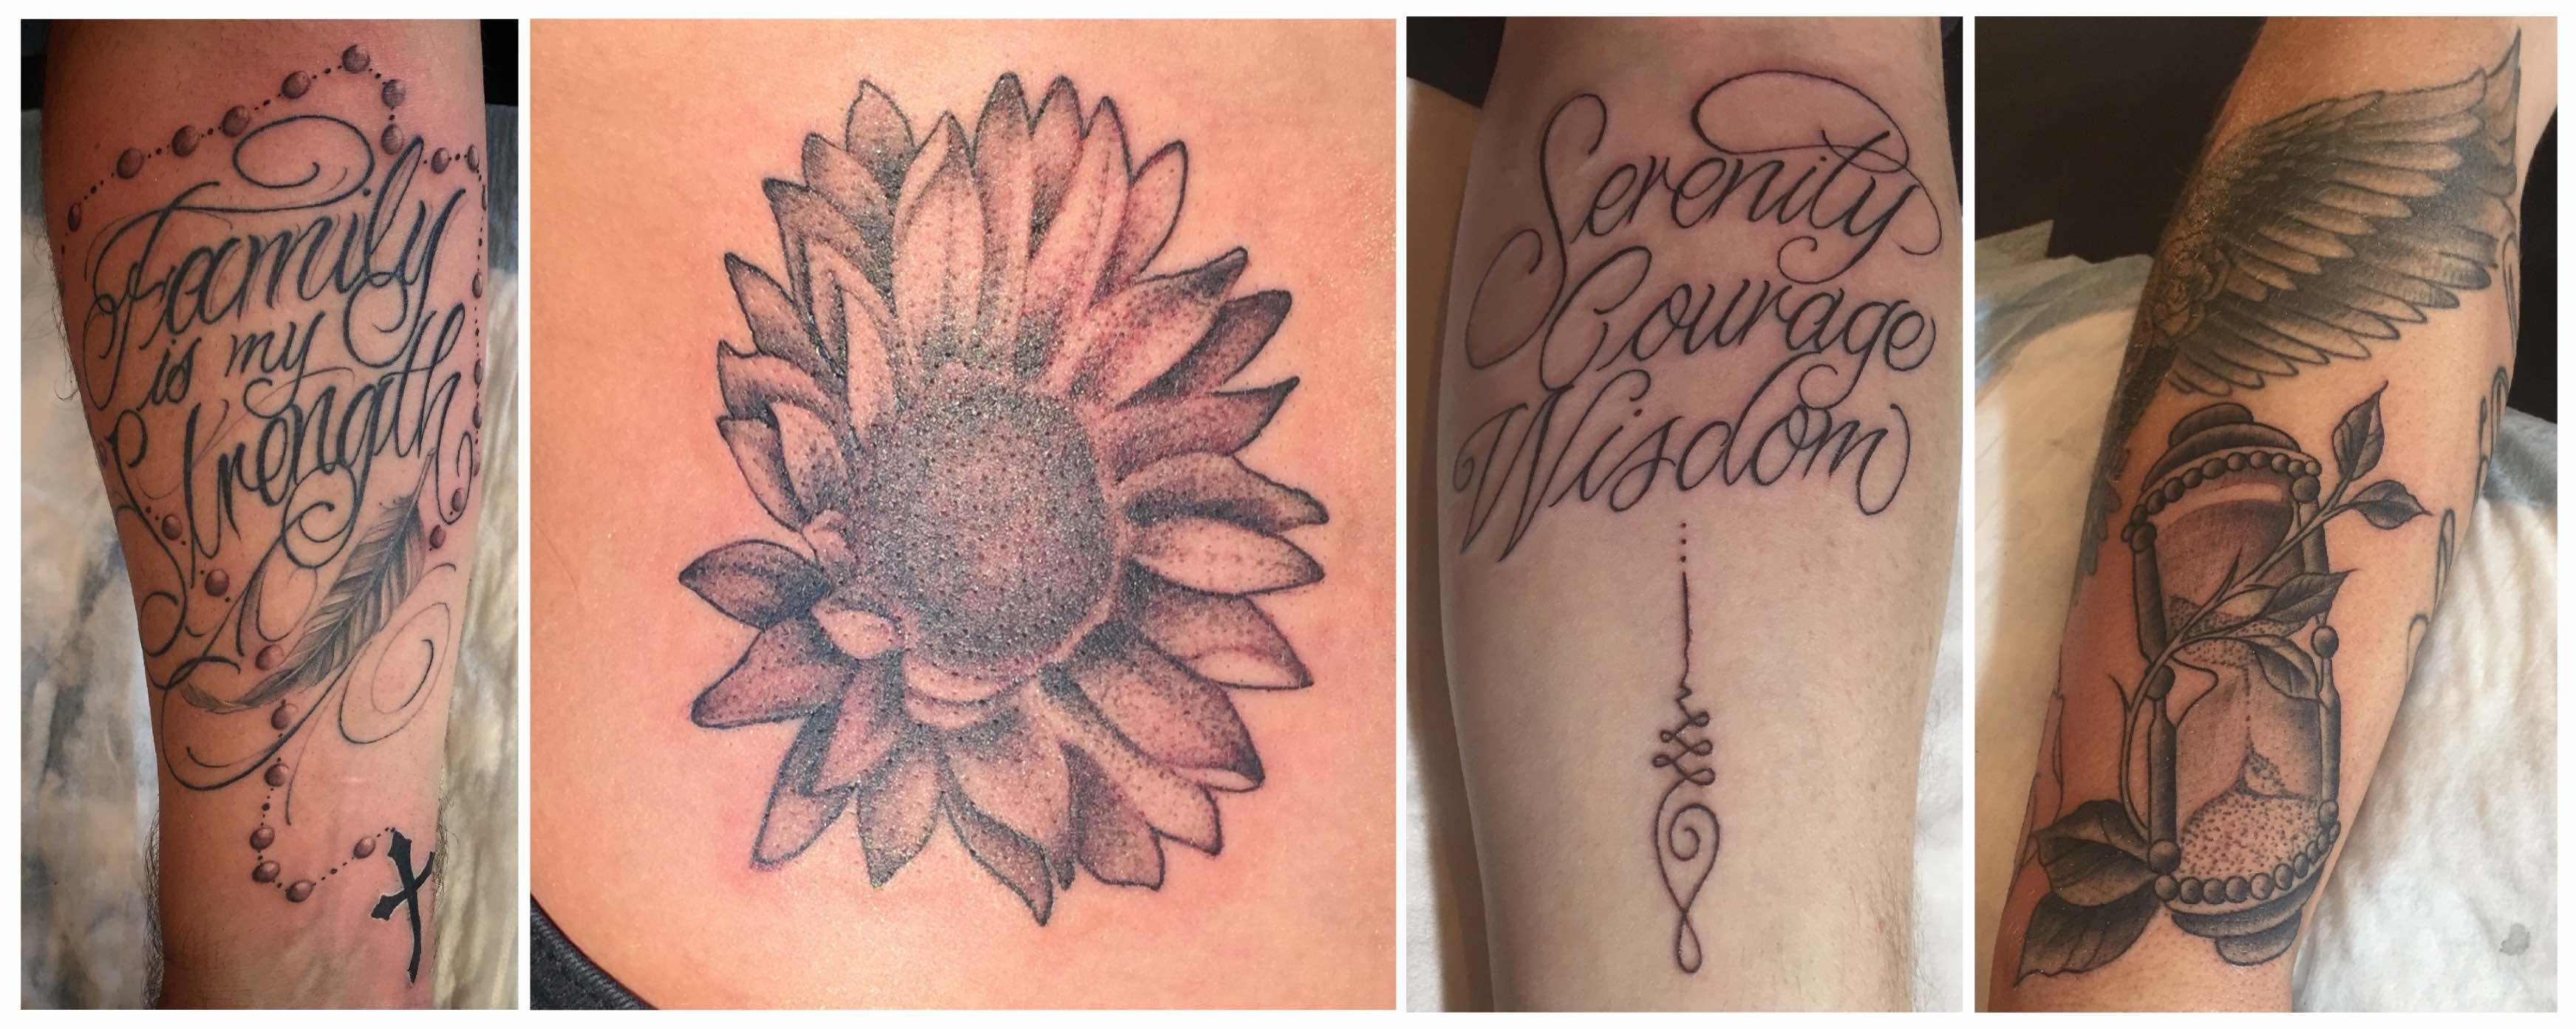 Tattoos done by Duran Niemach of SA Hardcore Social Club